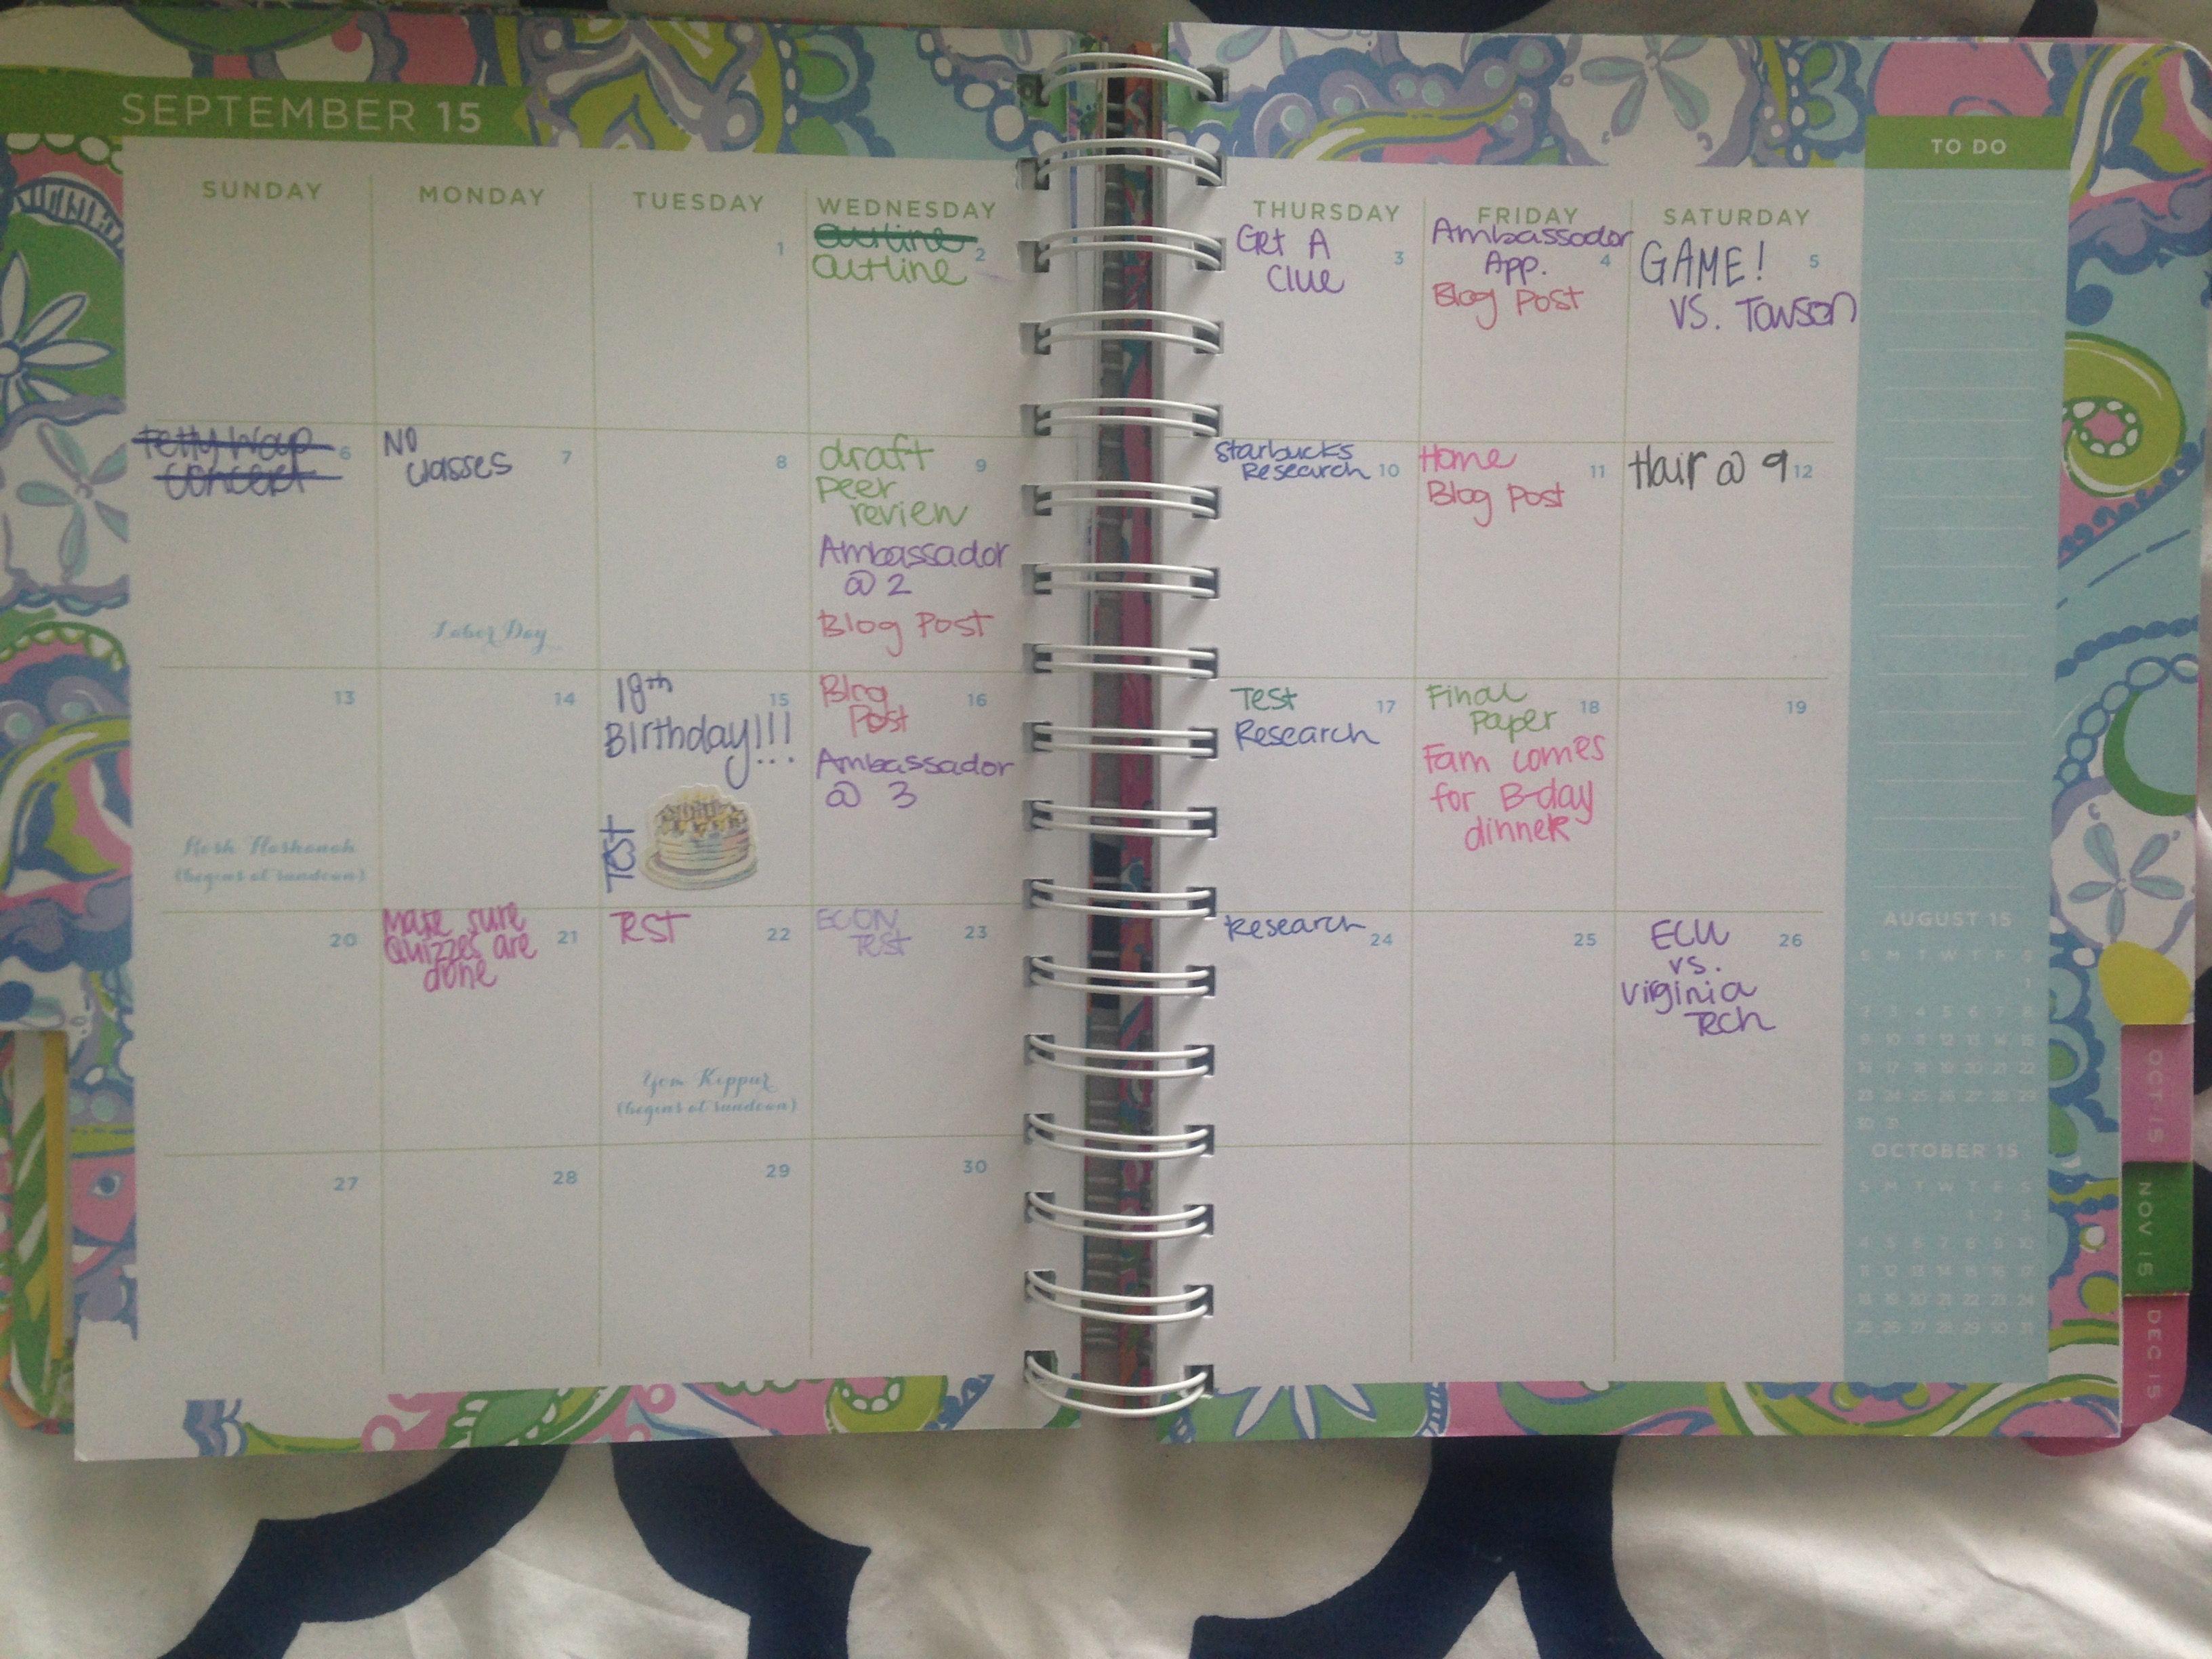 Check out how I organize my agenda!